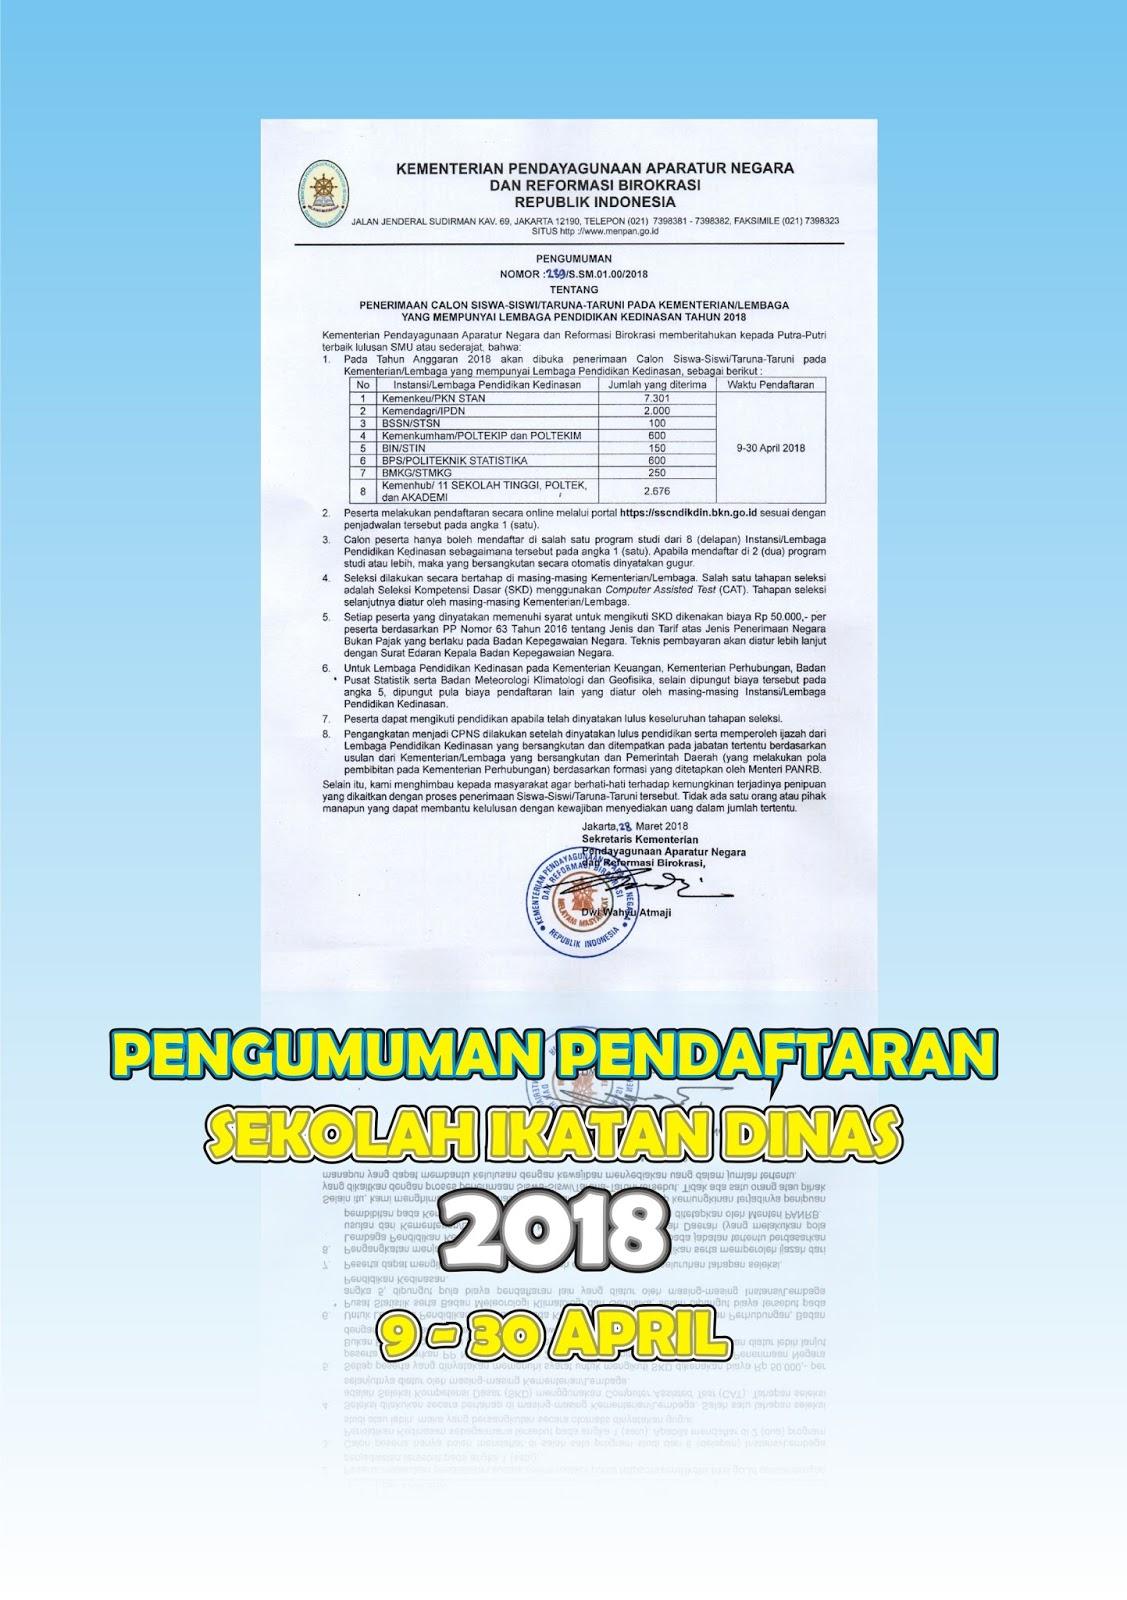 KemenPANRB Resmi Rilis Pengumuman Jadwal Pendaftaran